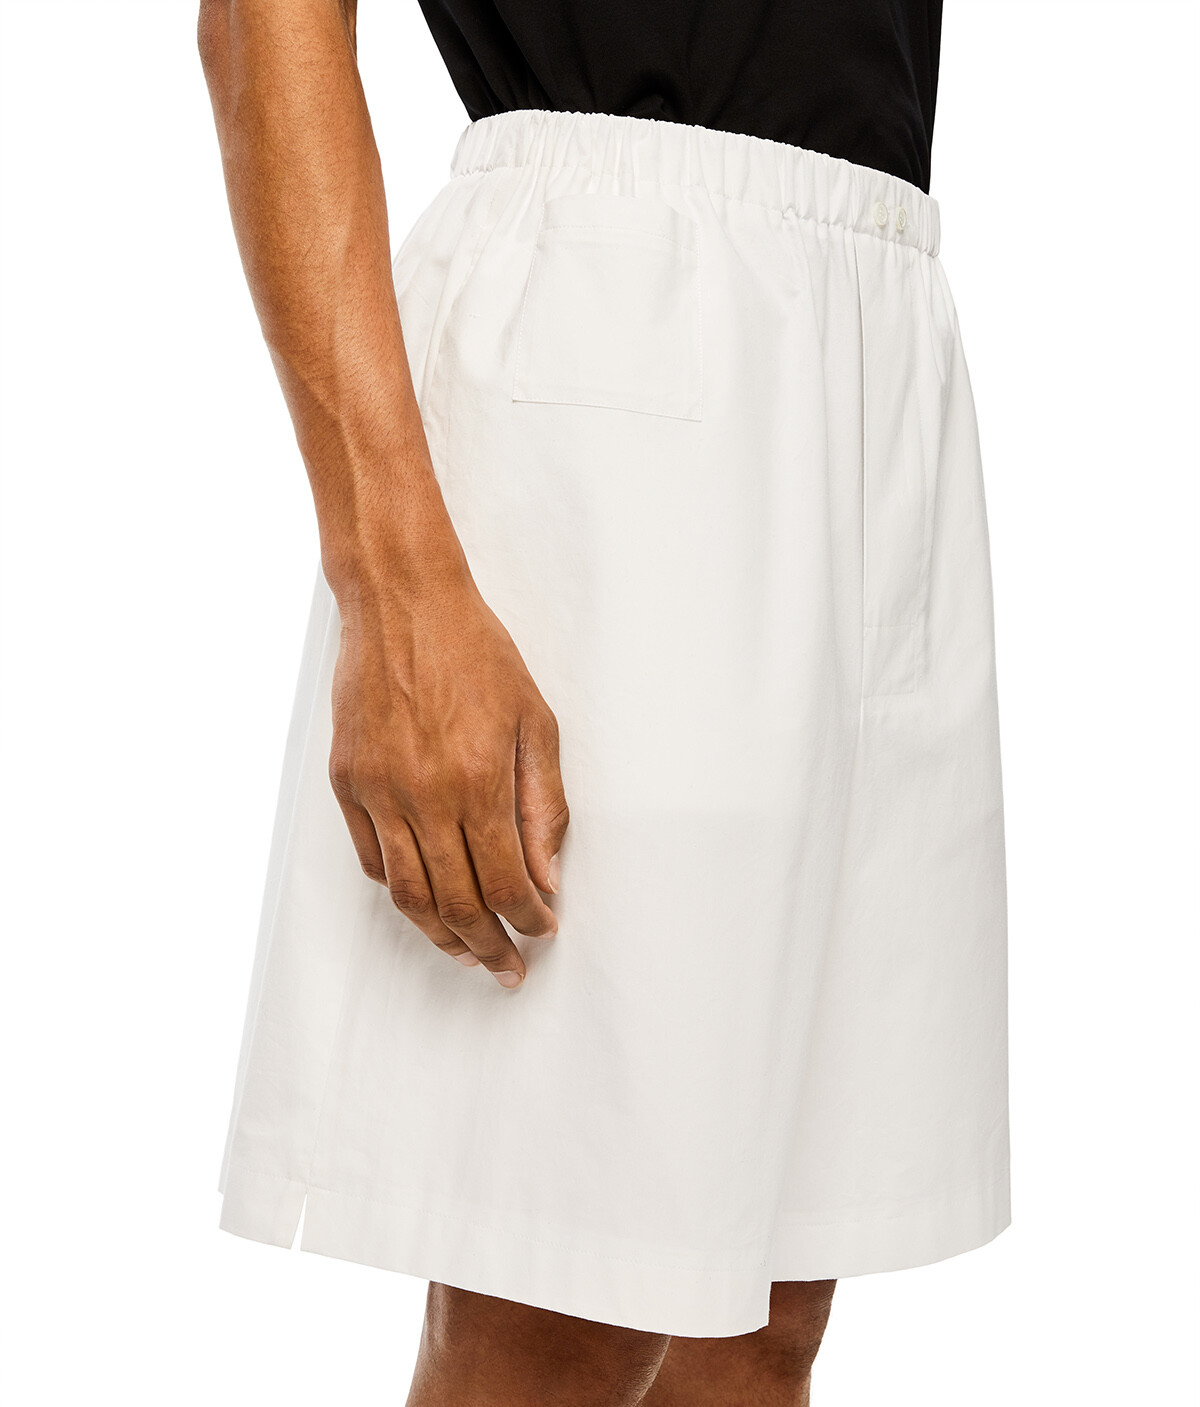 LOEWE Shorts ホワイト front